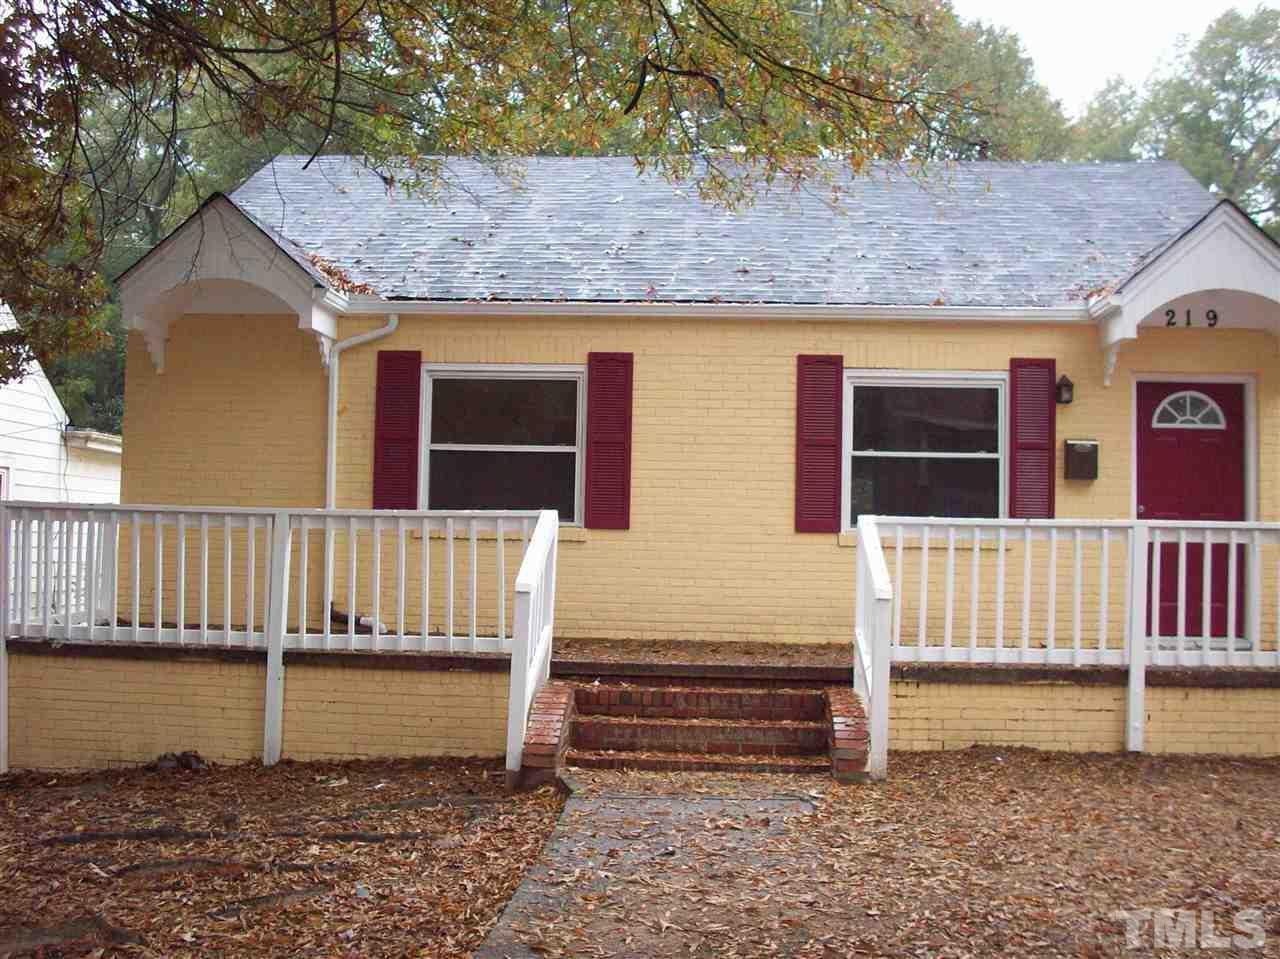 219 N Maple St, Durham, NC